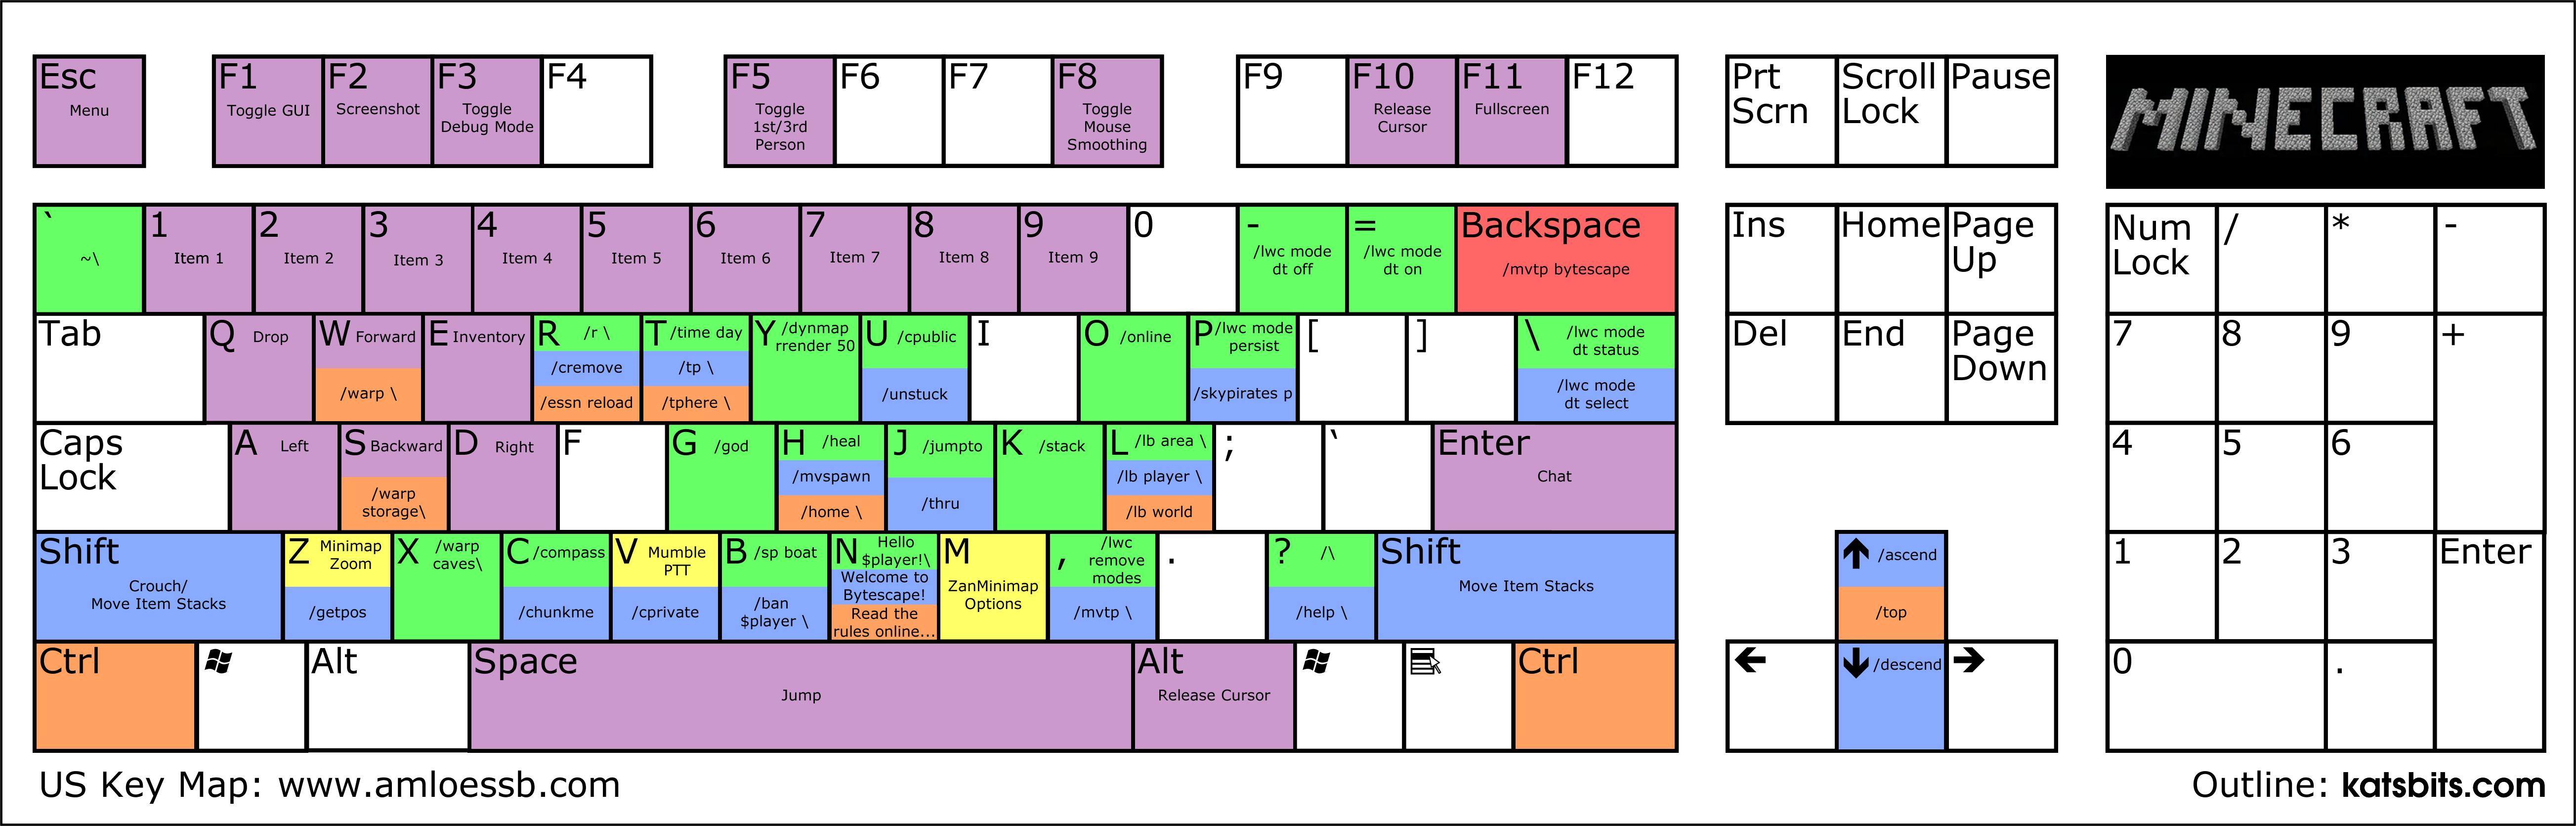 PowerSchool Learning : Minecraft EDU : Minecraft Basics